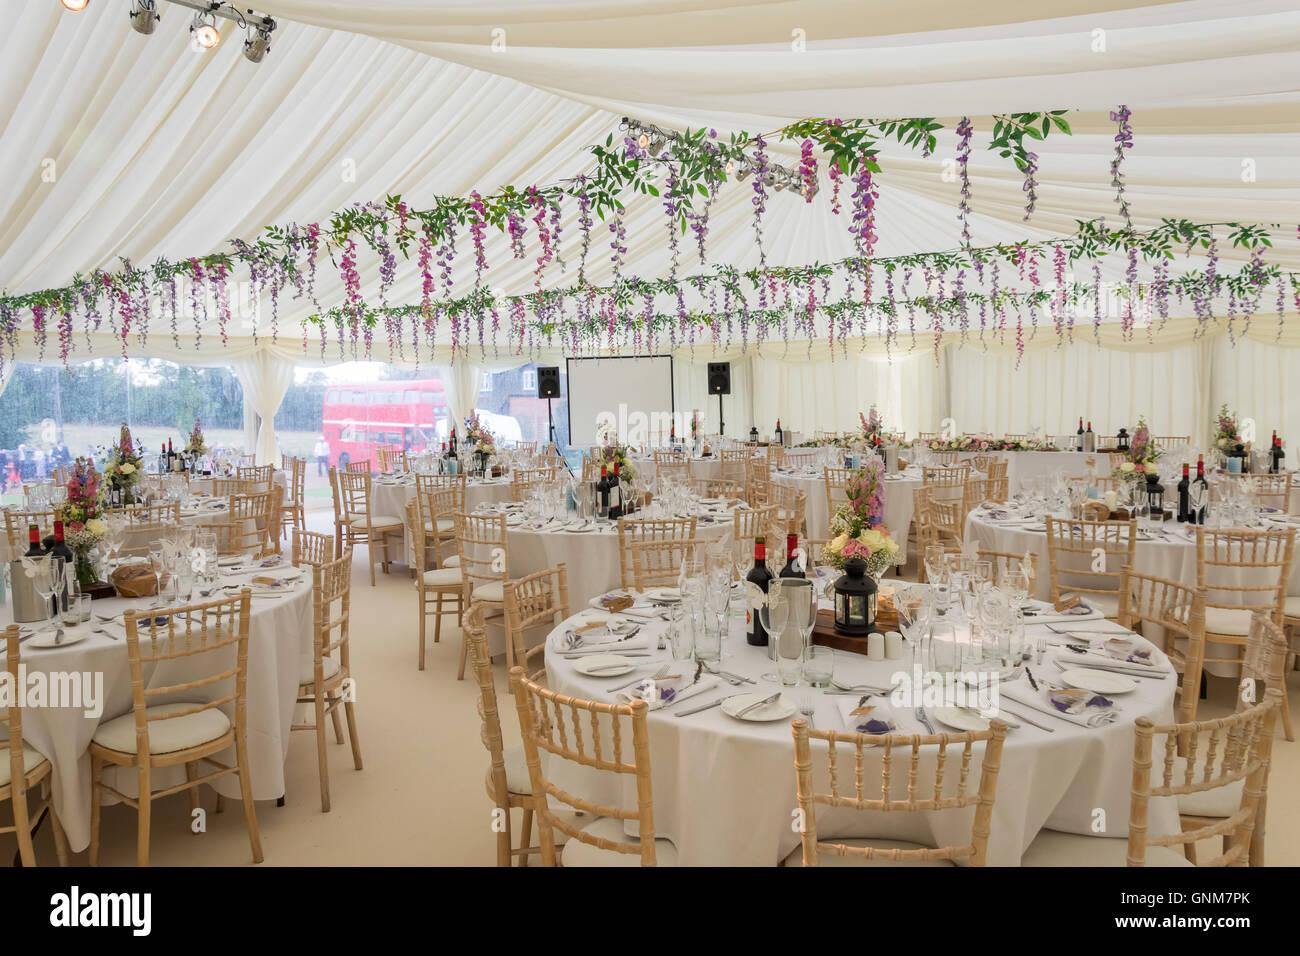 Wedding marquee ready for wedding guests, Preston Bissett, Buckinghamshire, England, United Kingdom Stock Photo